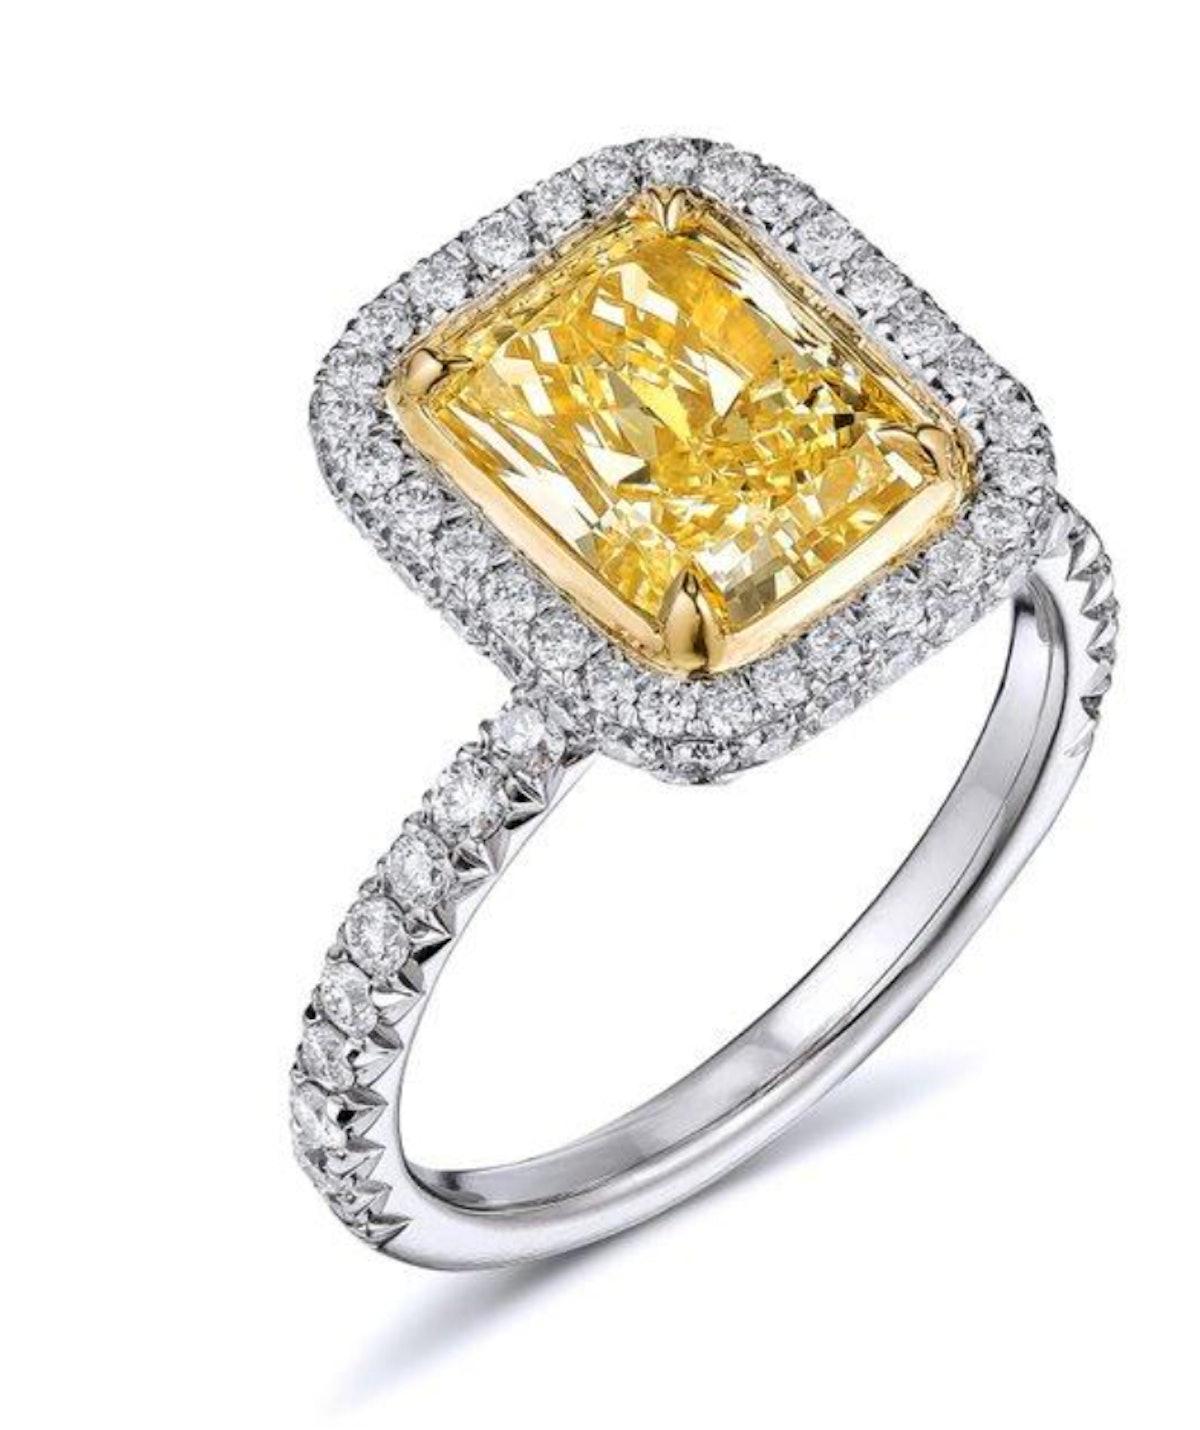 2.67 Carat Fancy Yellow Radiant Cut Diamond Engagement Ring In Platinum